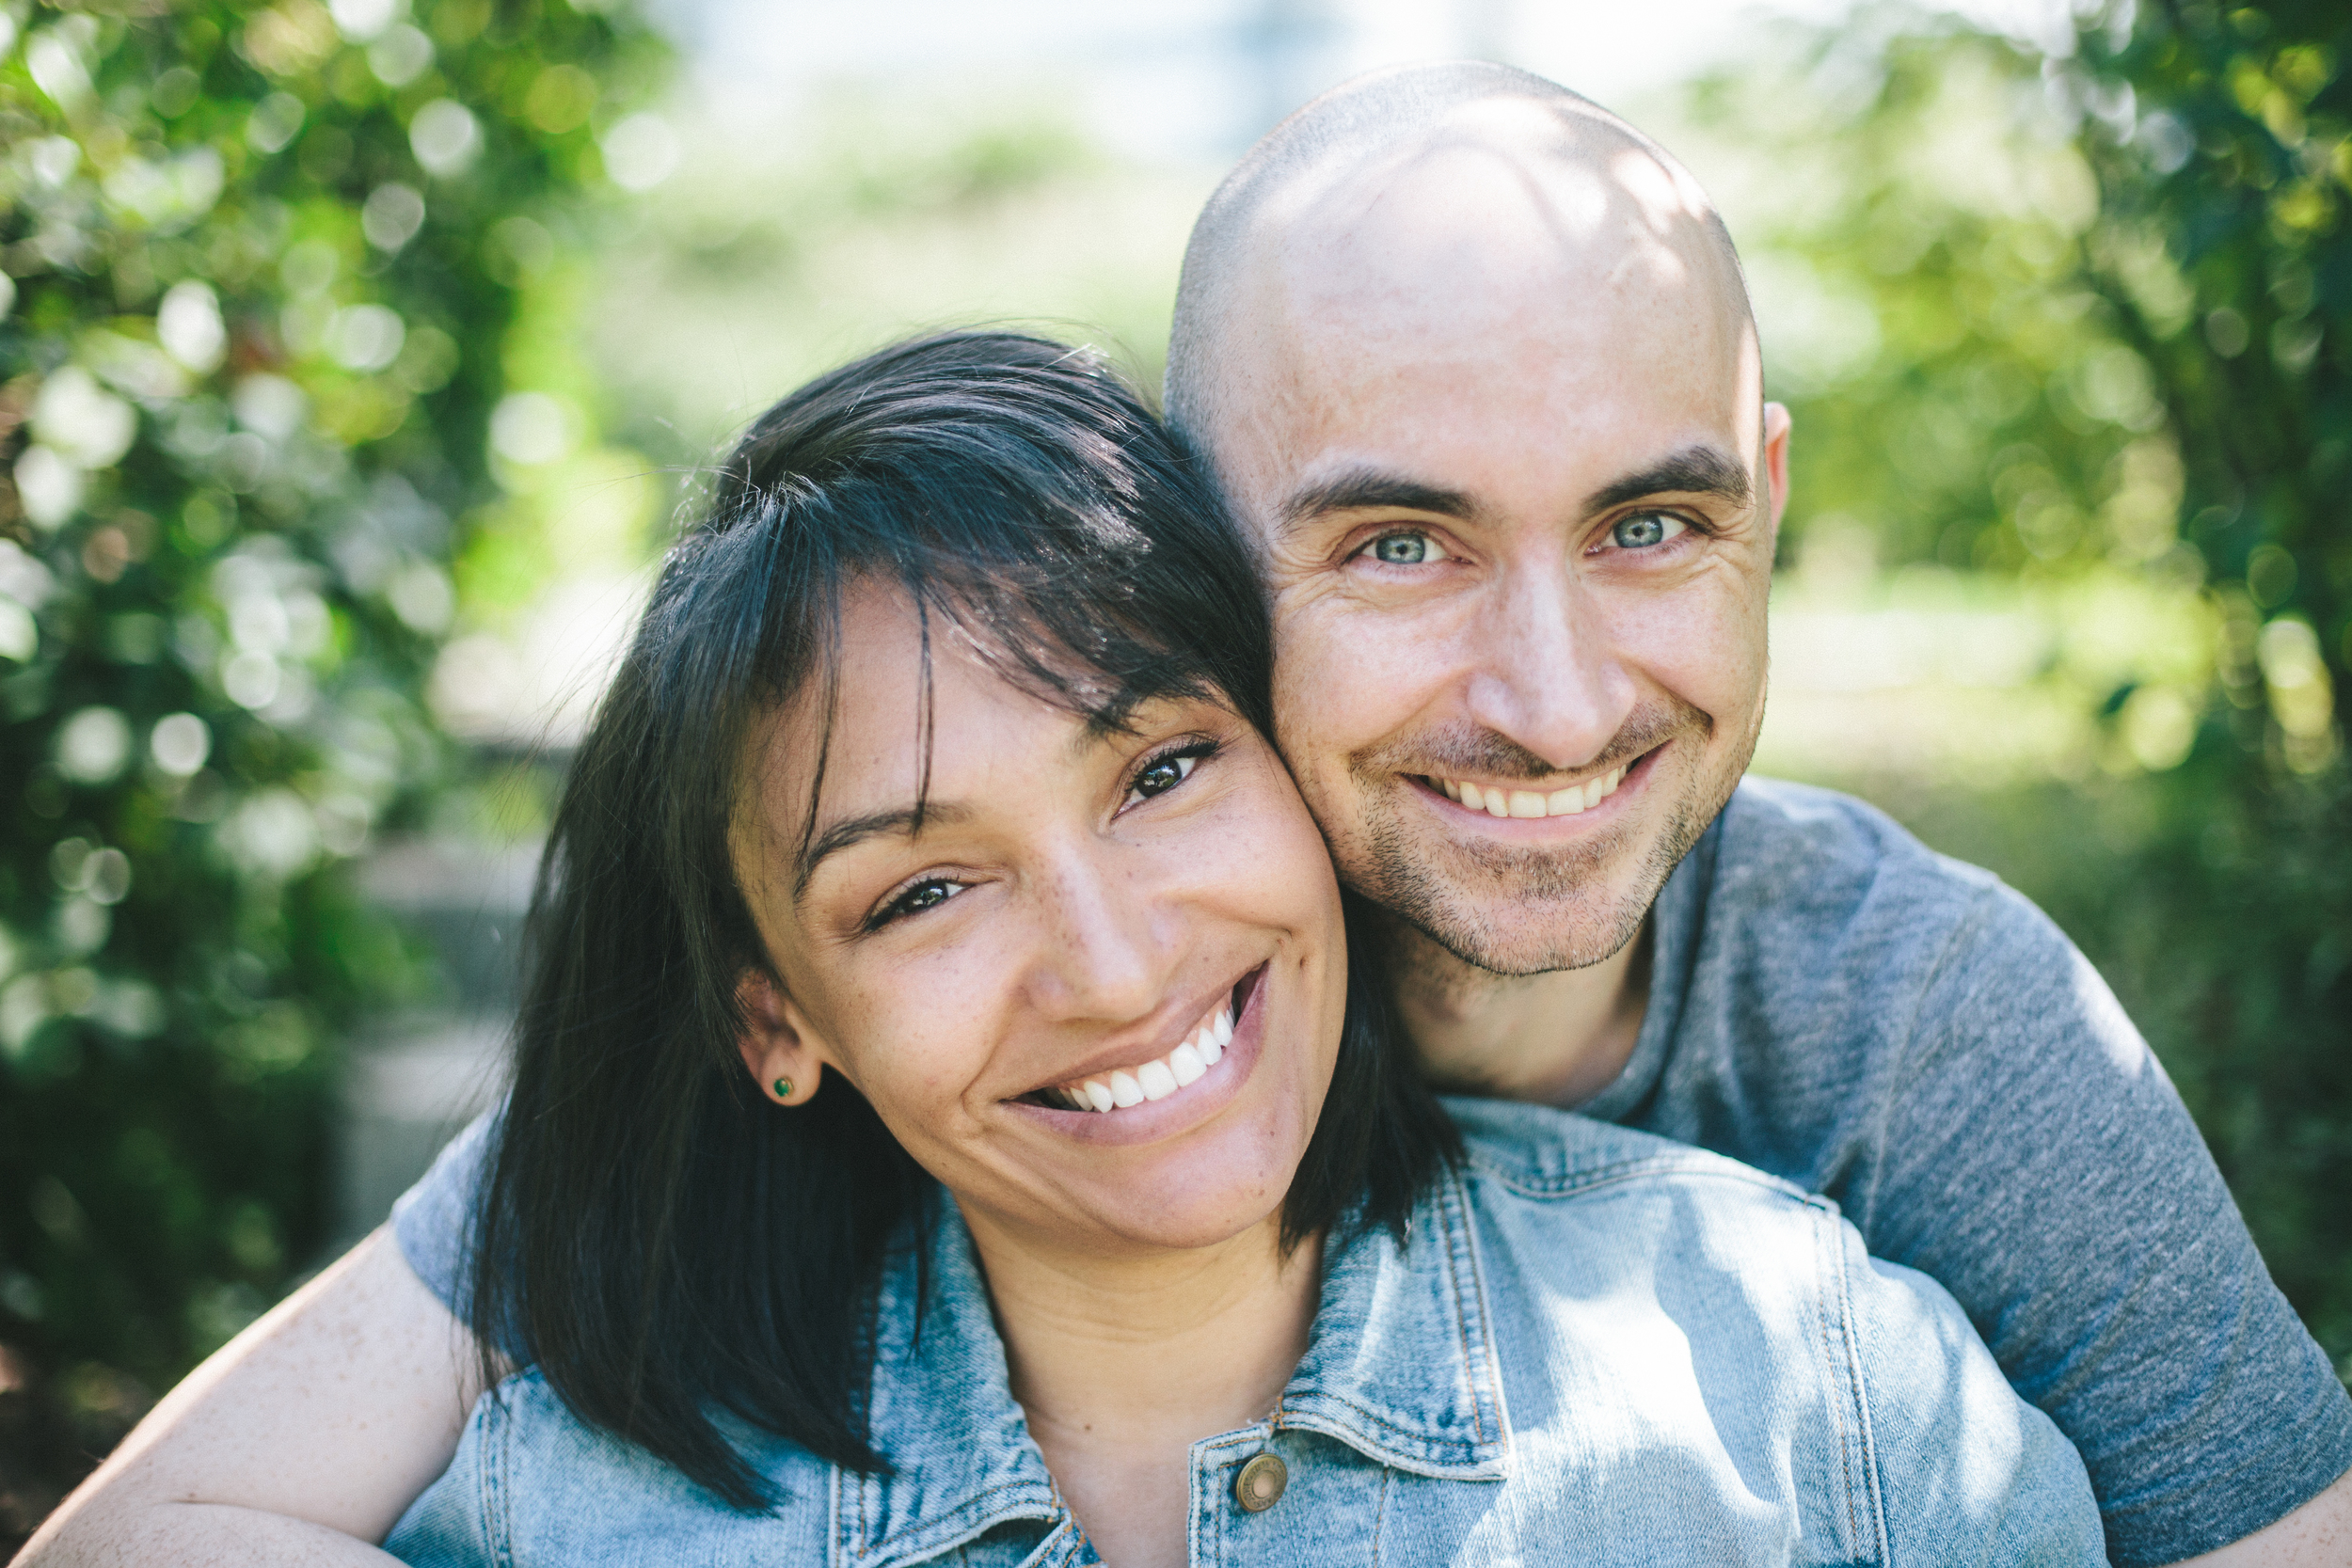 vancouverfamilyphotographer-21.jpg